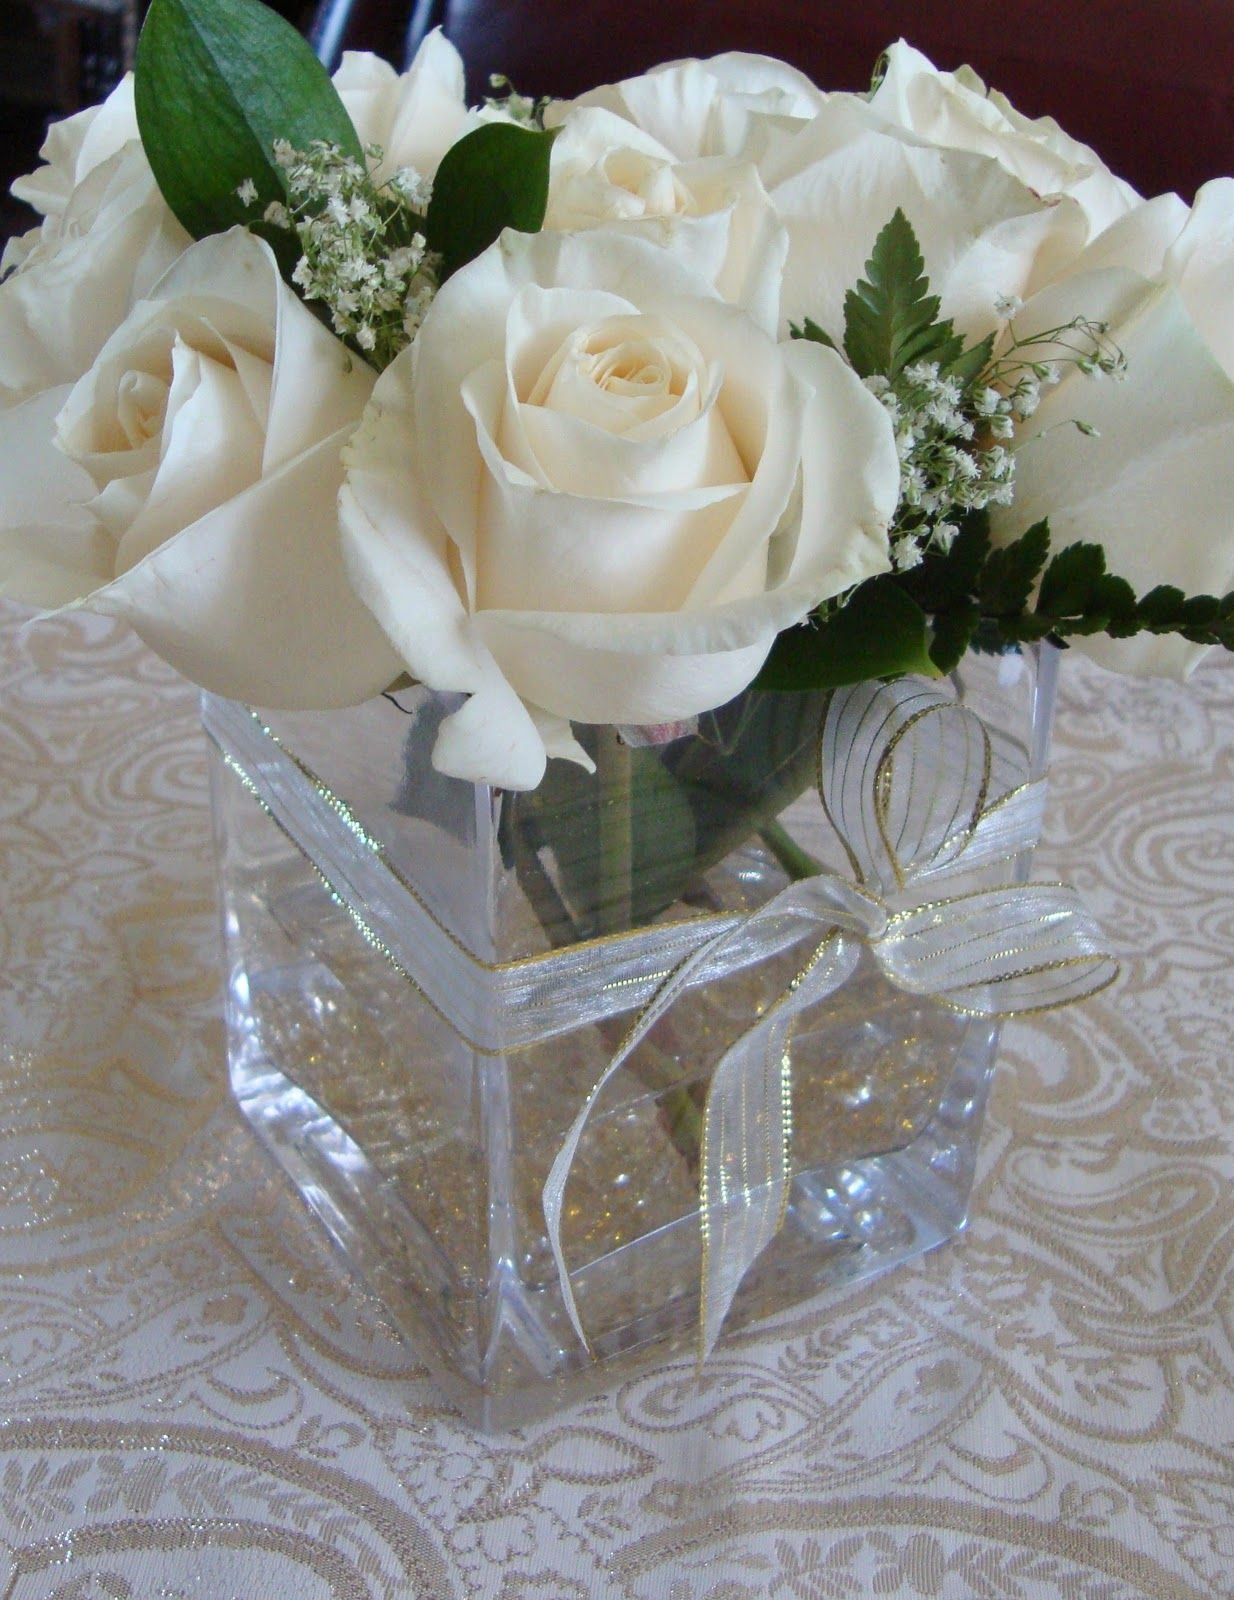 Honey Sweet Home DIY Wedding u Mehndi Decor Ideas On The Cheap